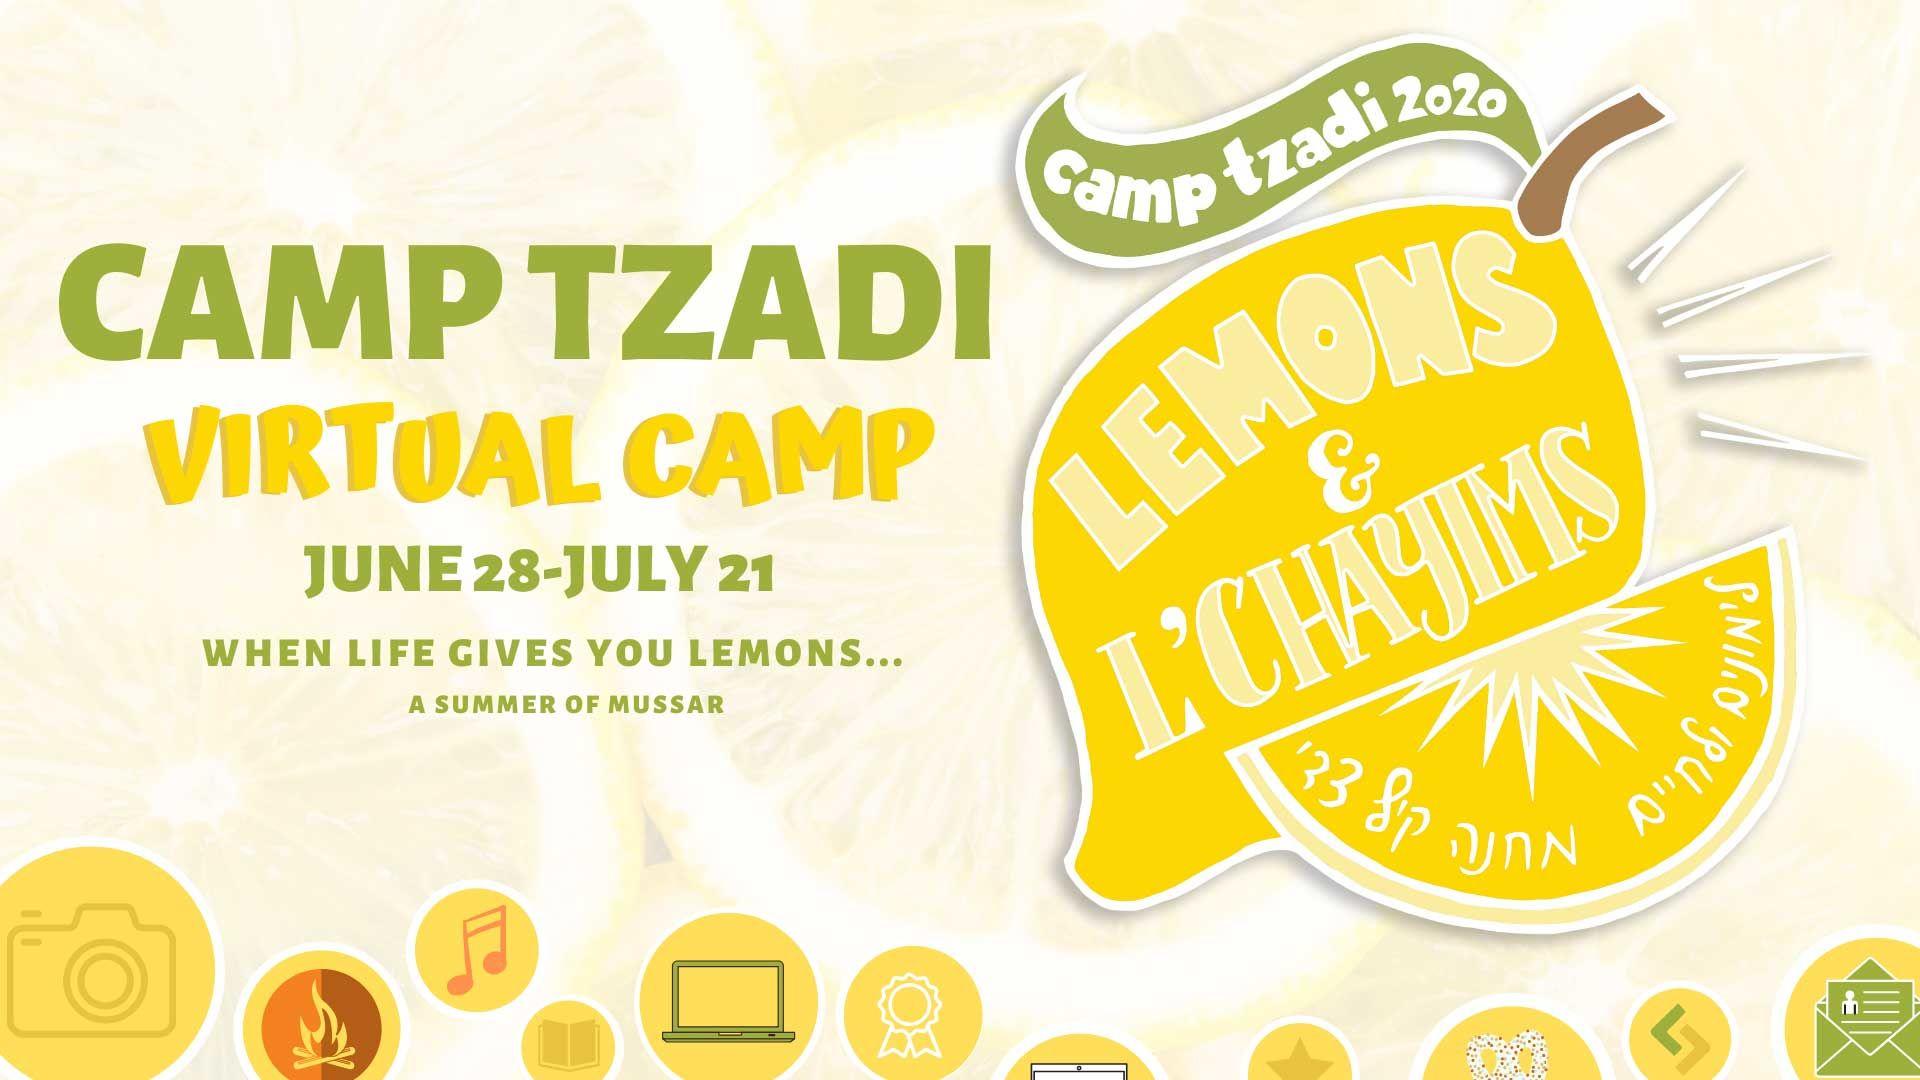 Lemons & L'Chayims 2020